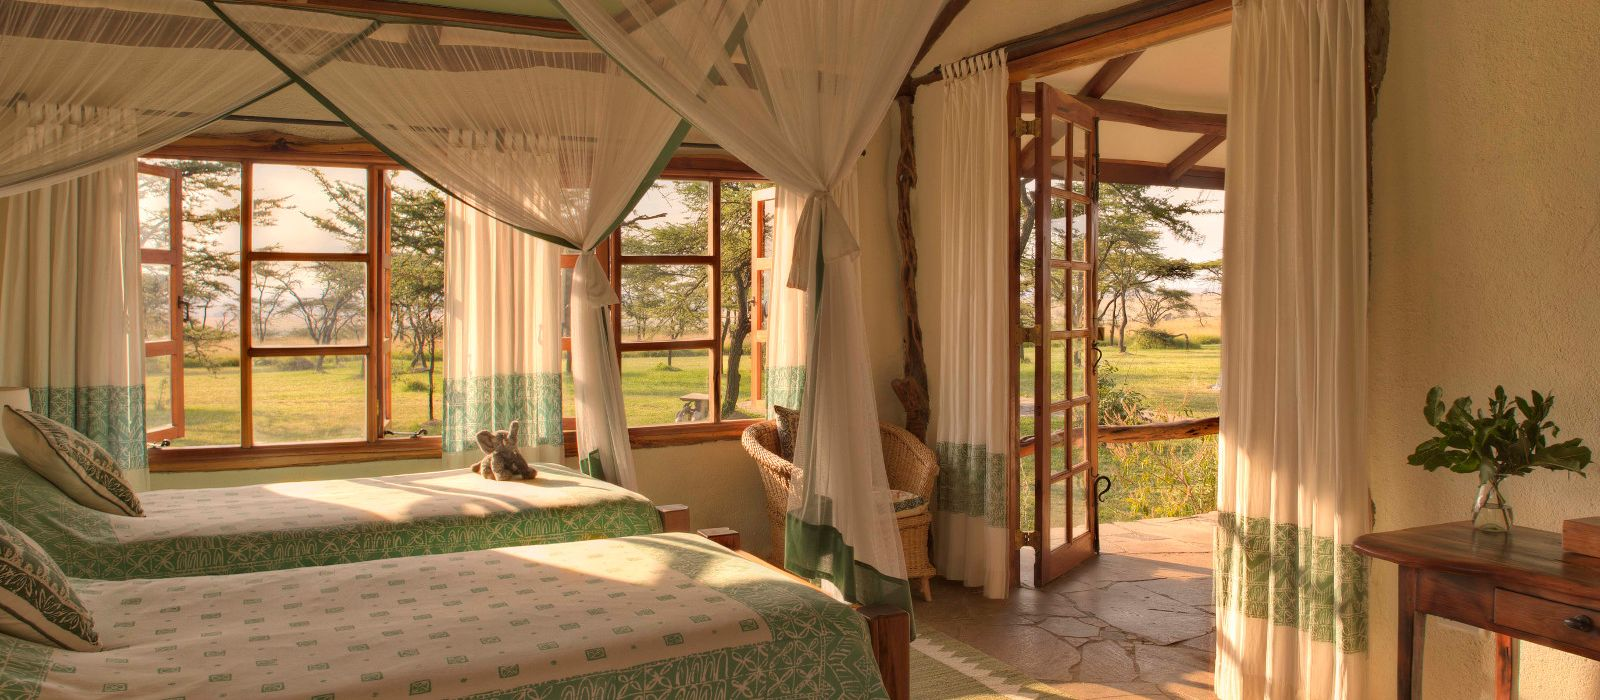 Hotel Isoitok Tented Camp %region%